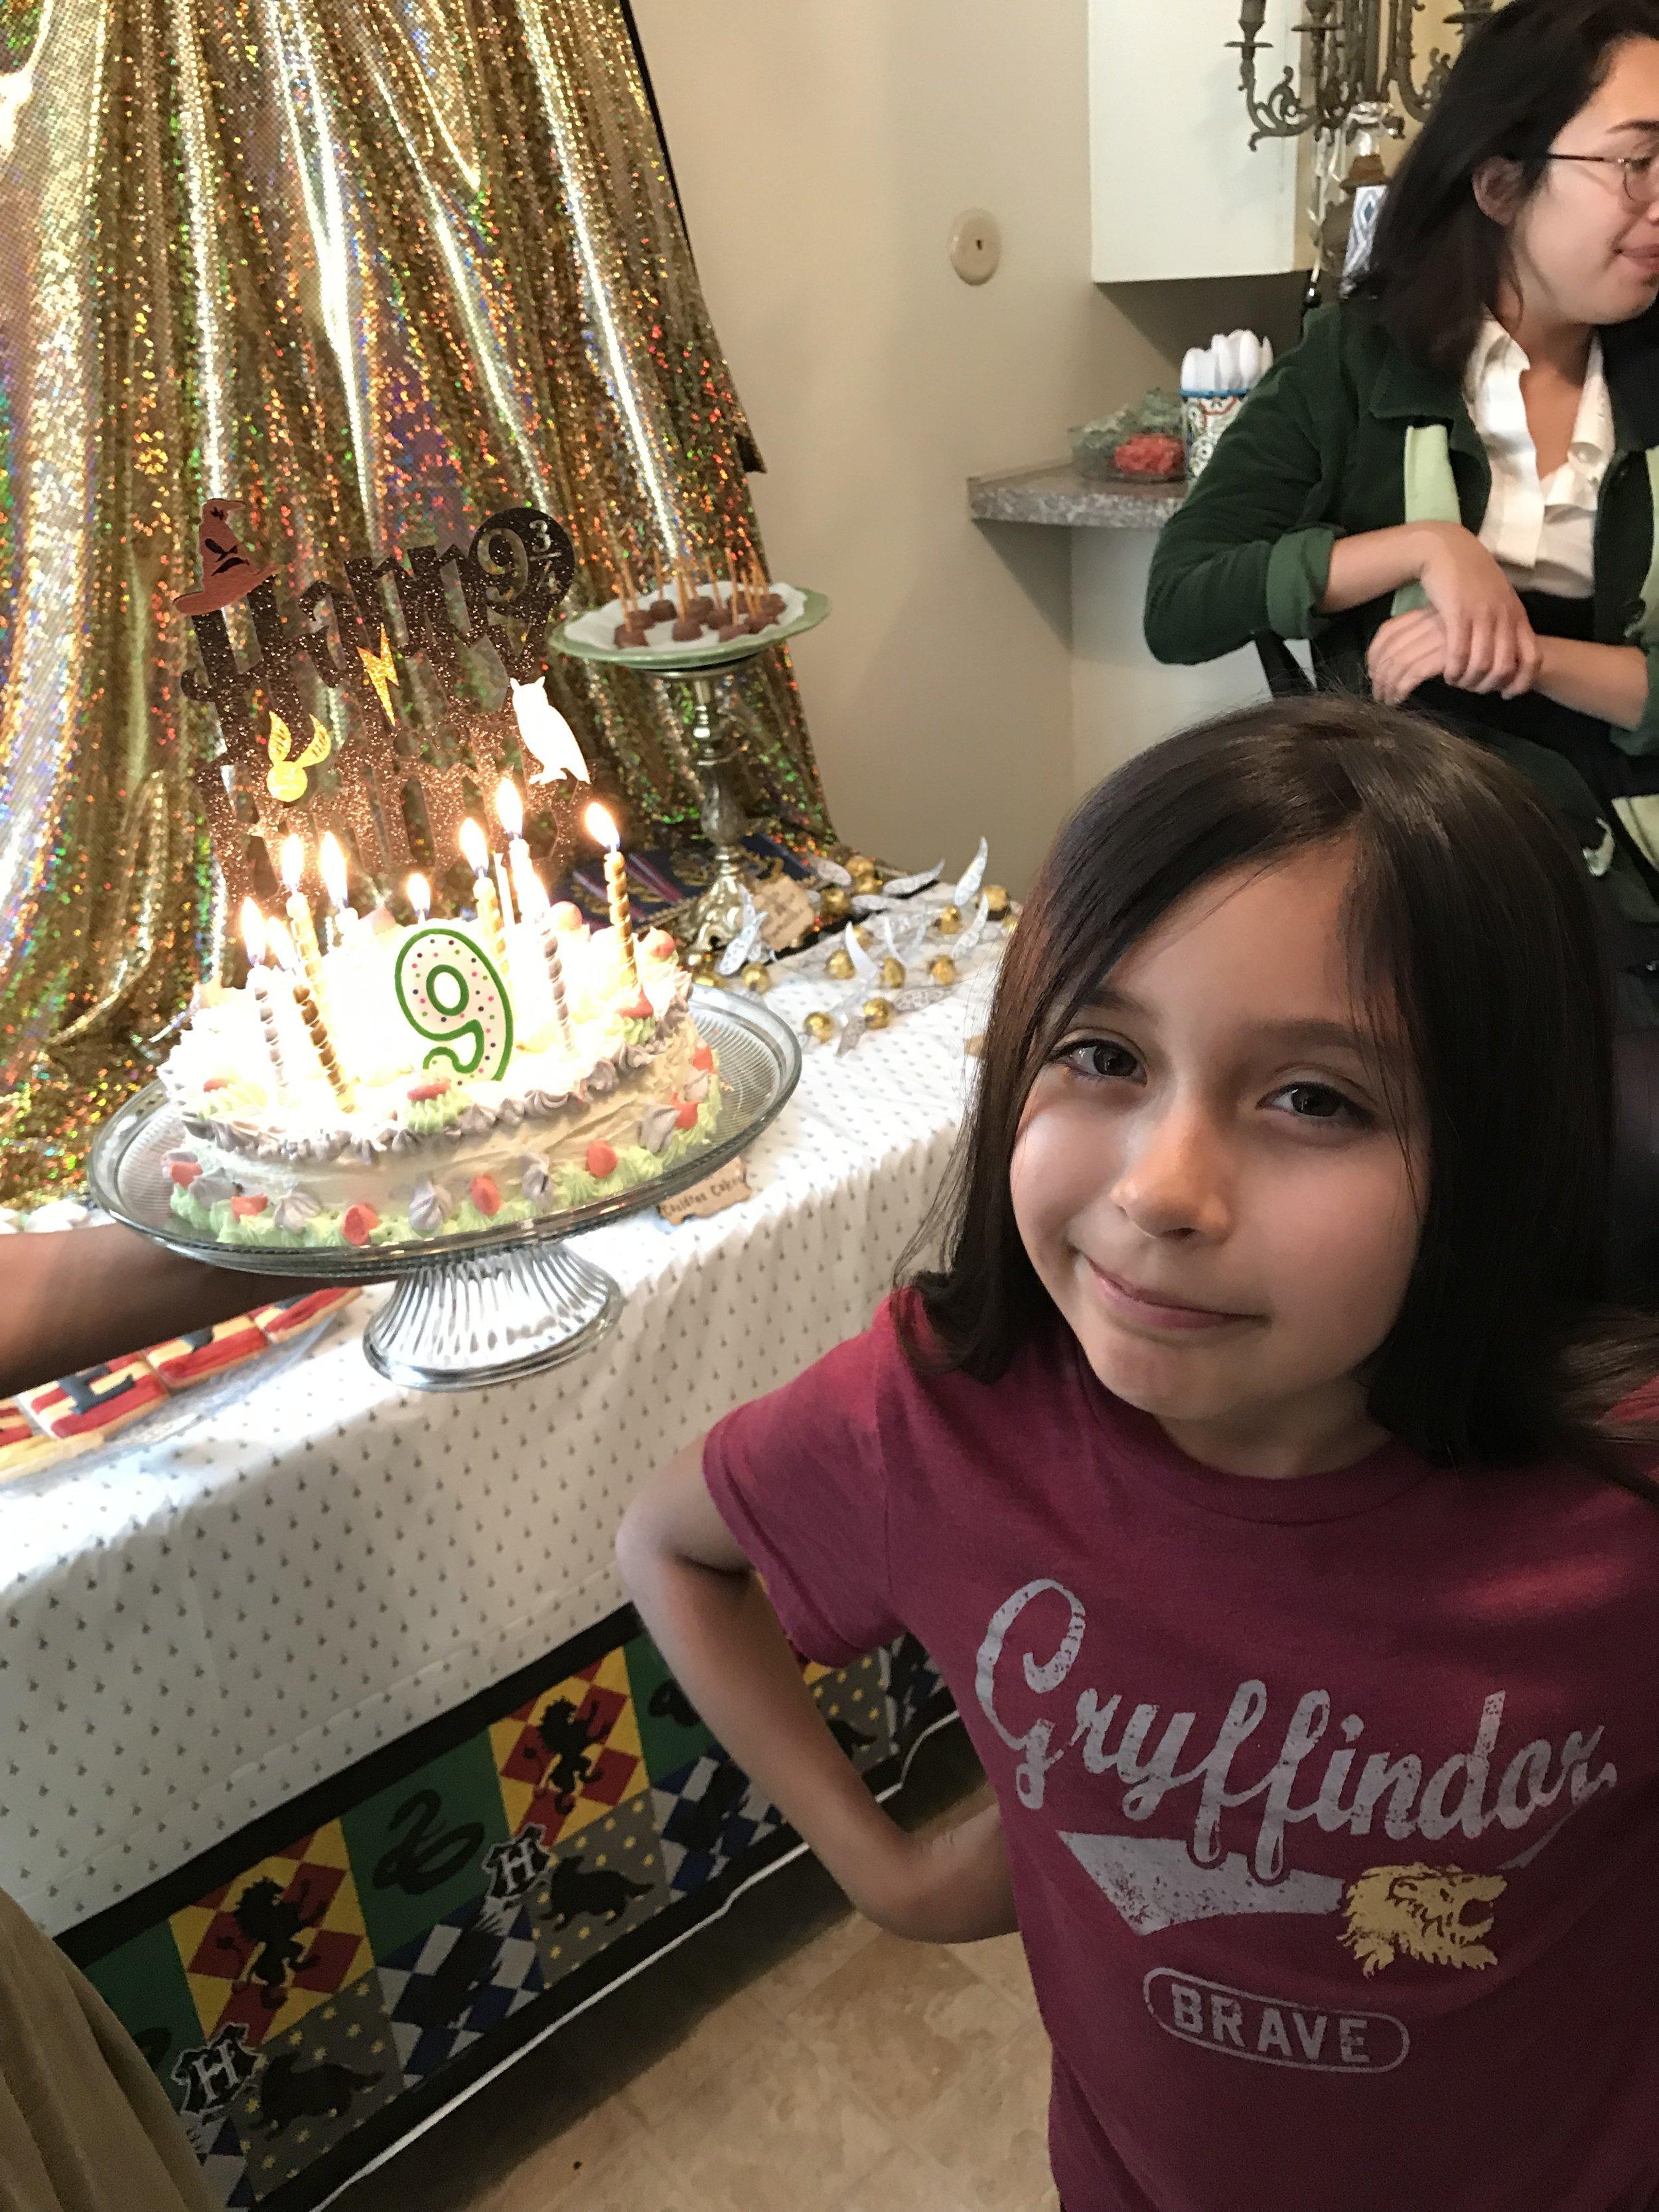 Happy 9th birthday future Gryffindor!